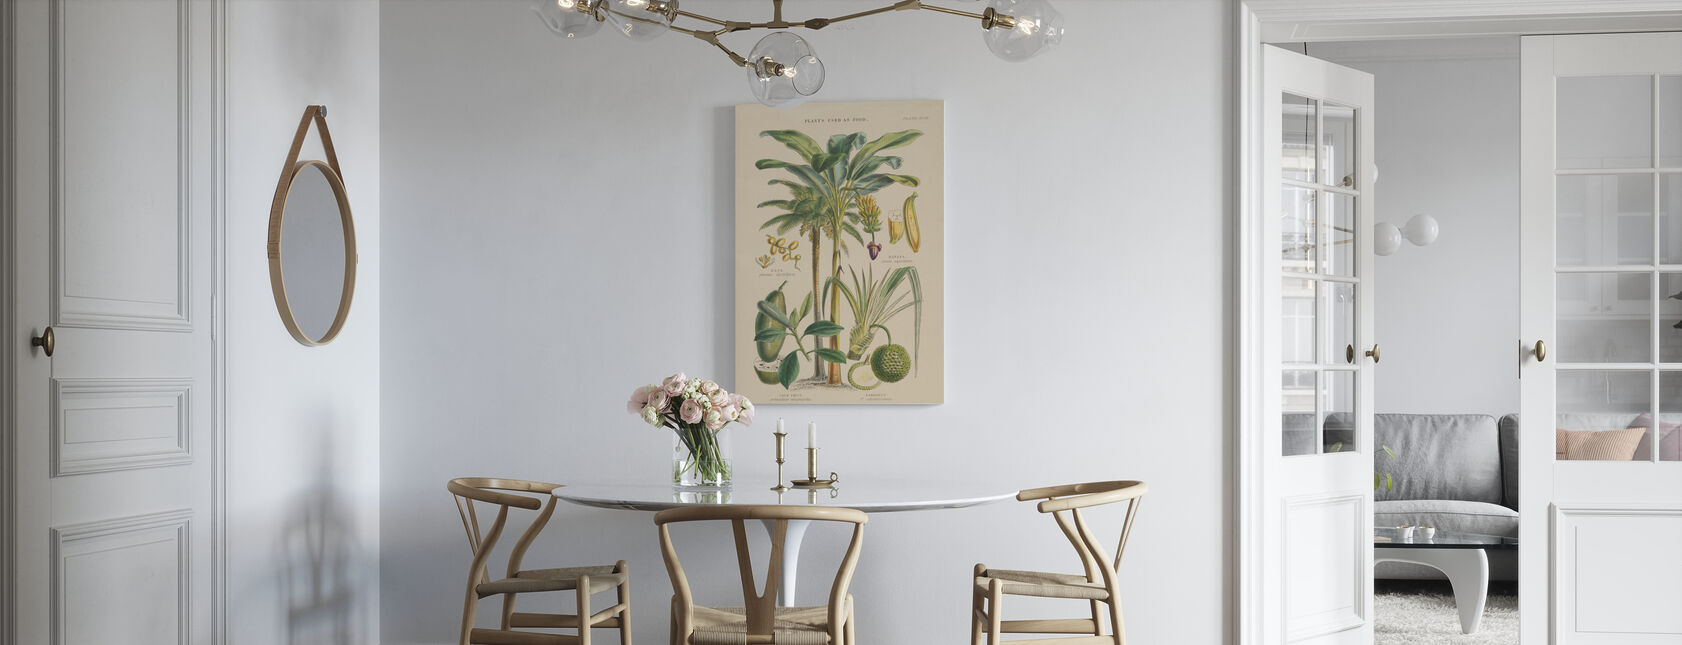 Fruitbomen - Canvas print - Keuken